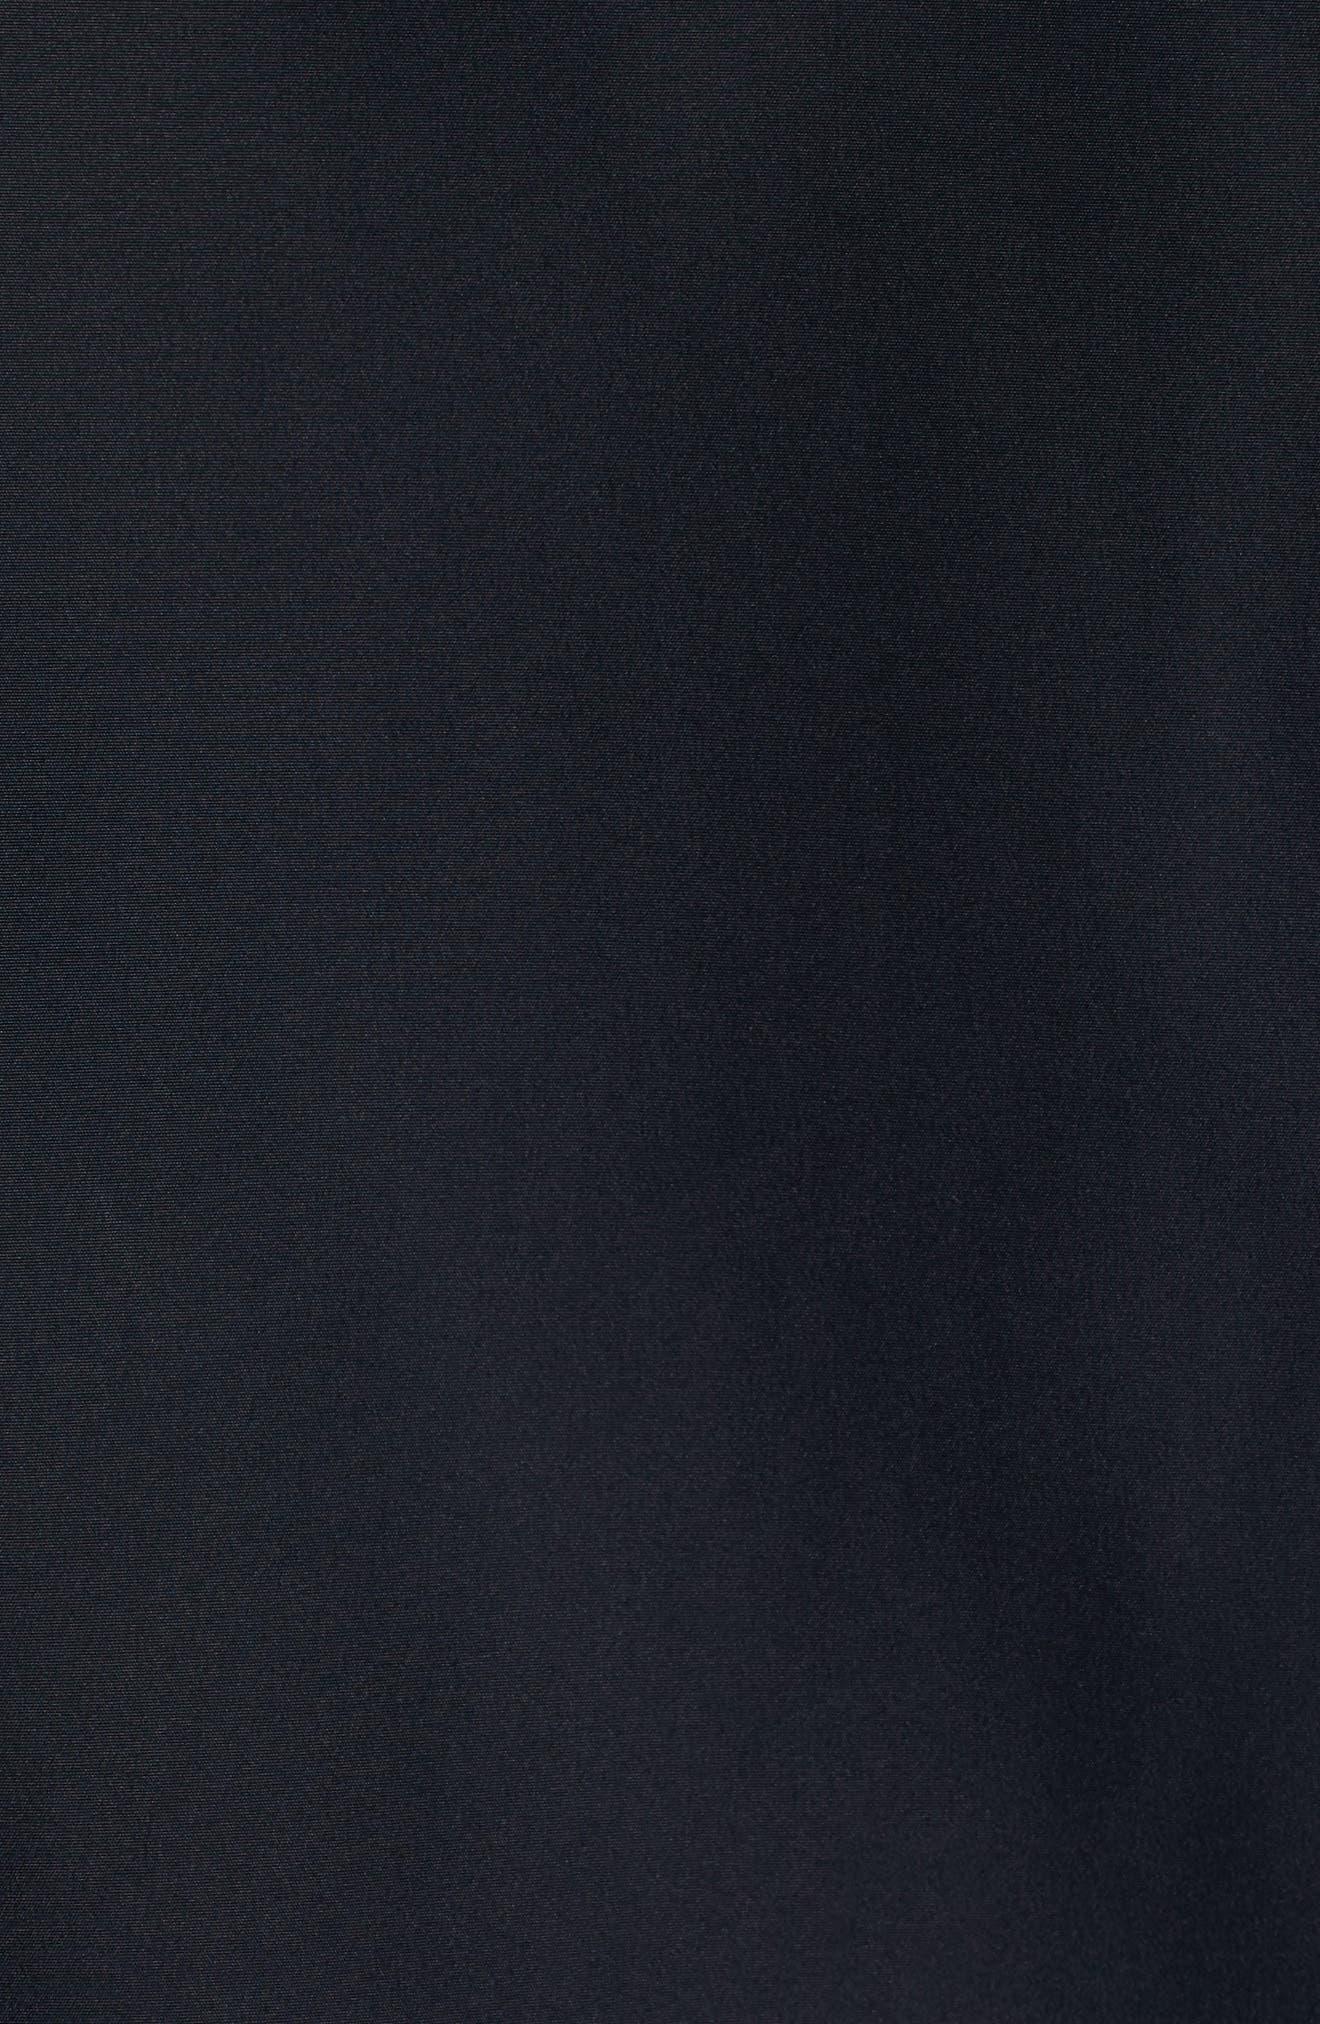 'Seven J' Waterproof & Windproof Jacket,                             Alternate thumbnail 5, color,                             Navy Blue